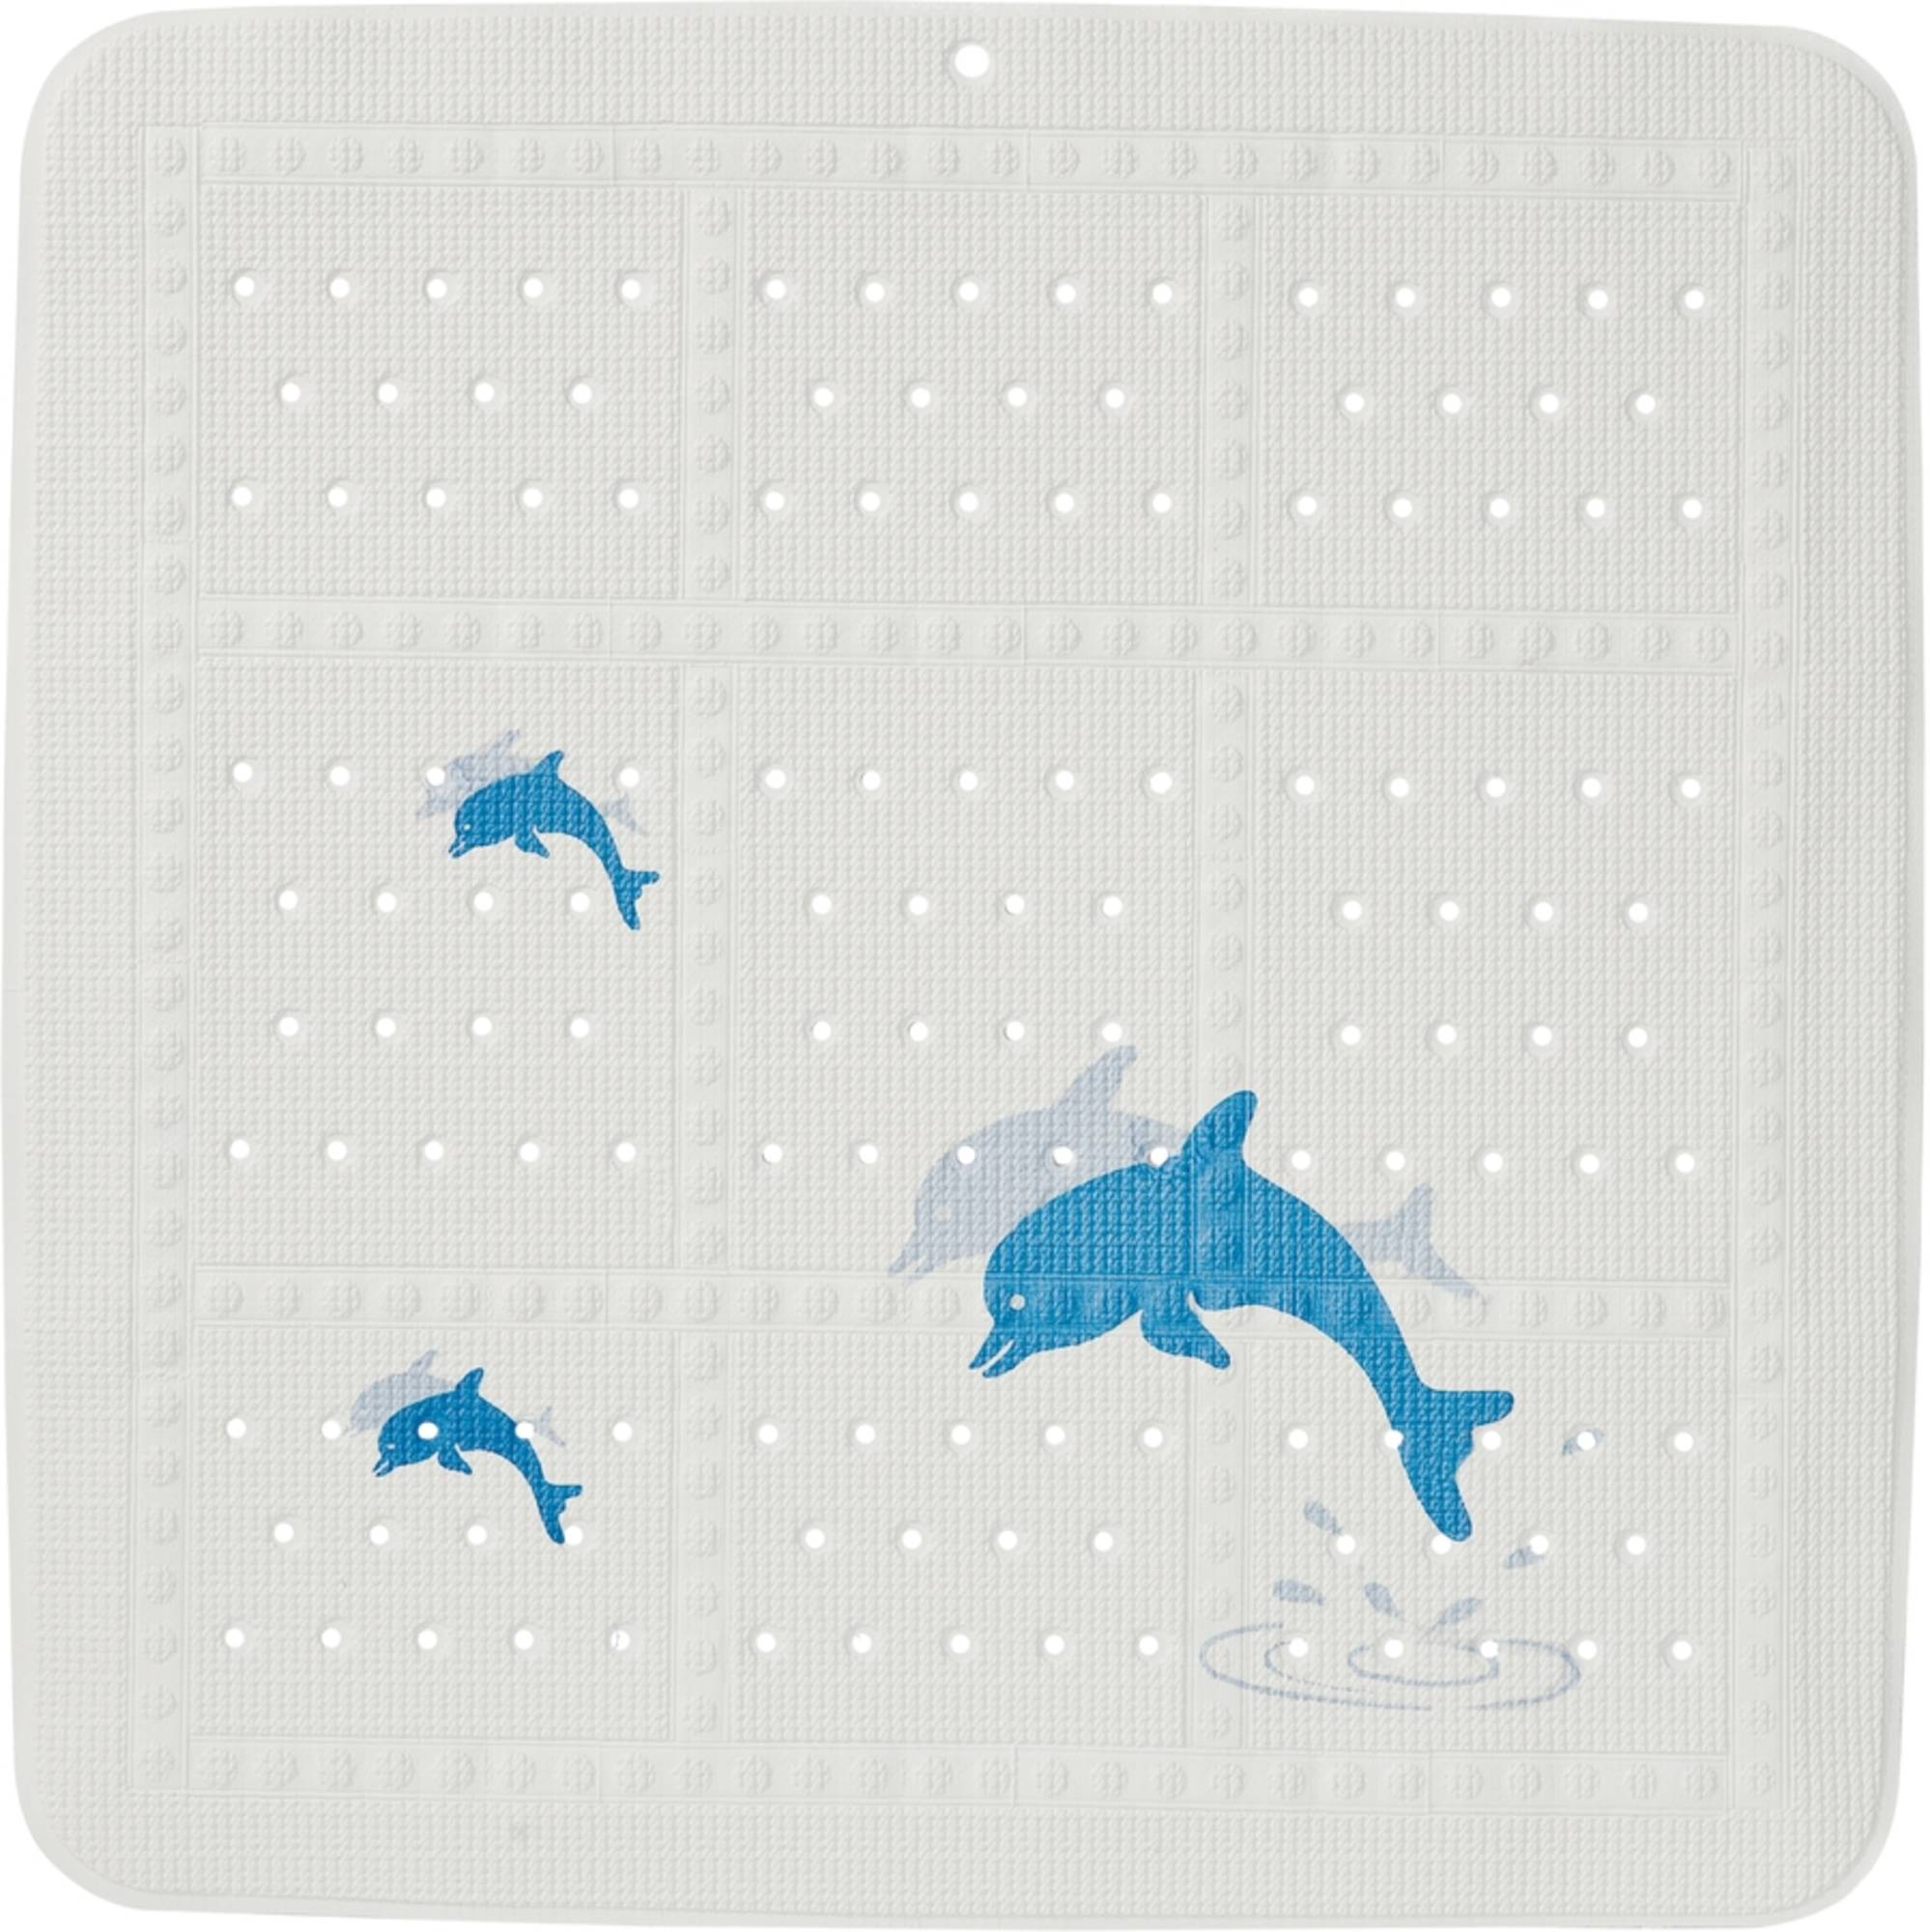 Sealskin Montreal veiligheidsmat pvc 55x55cm wit blauw dolfijntjes design